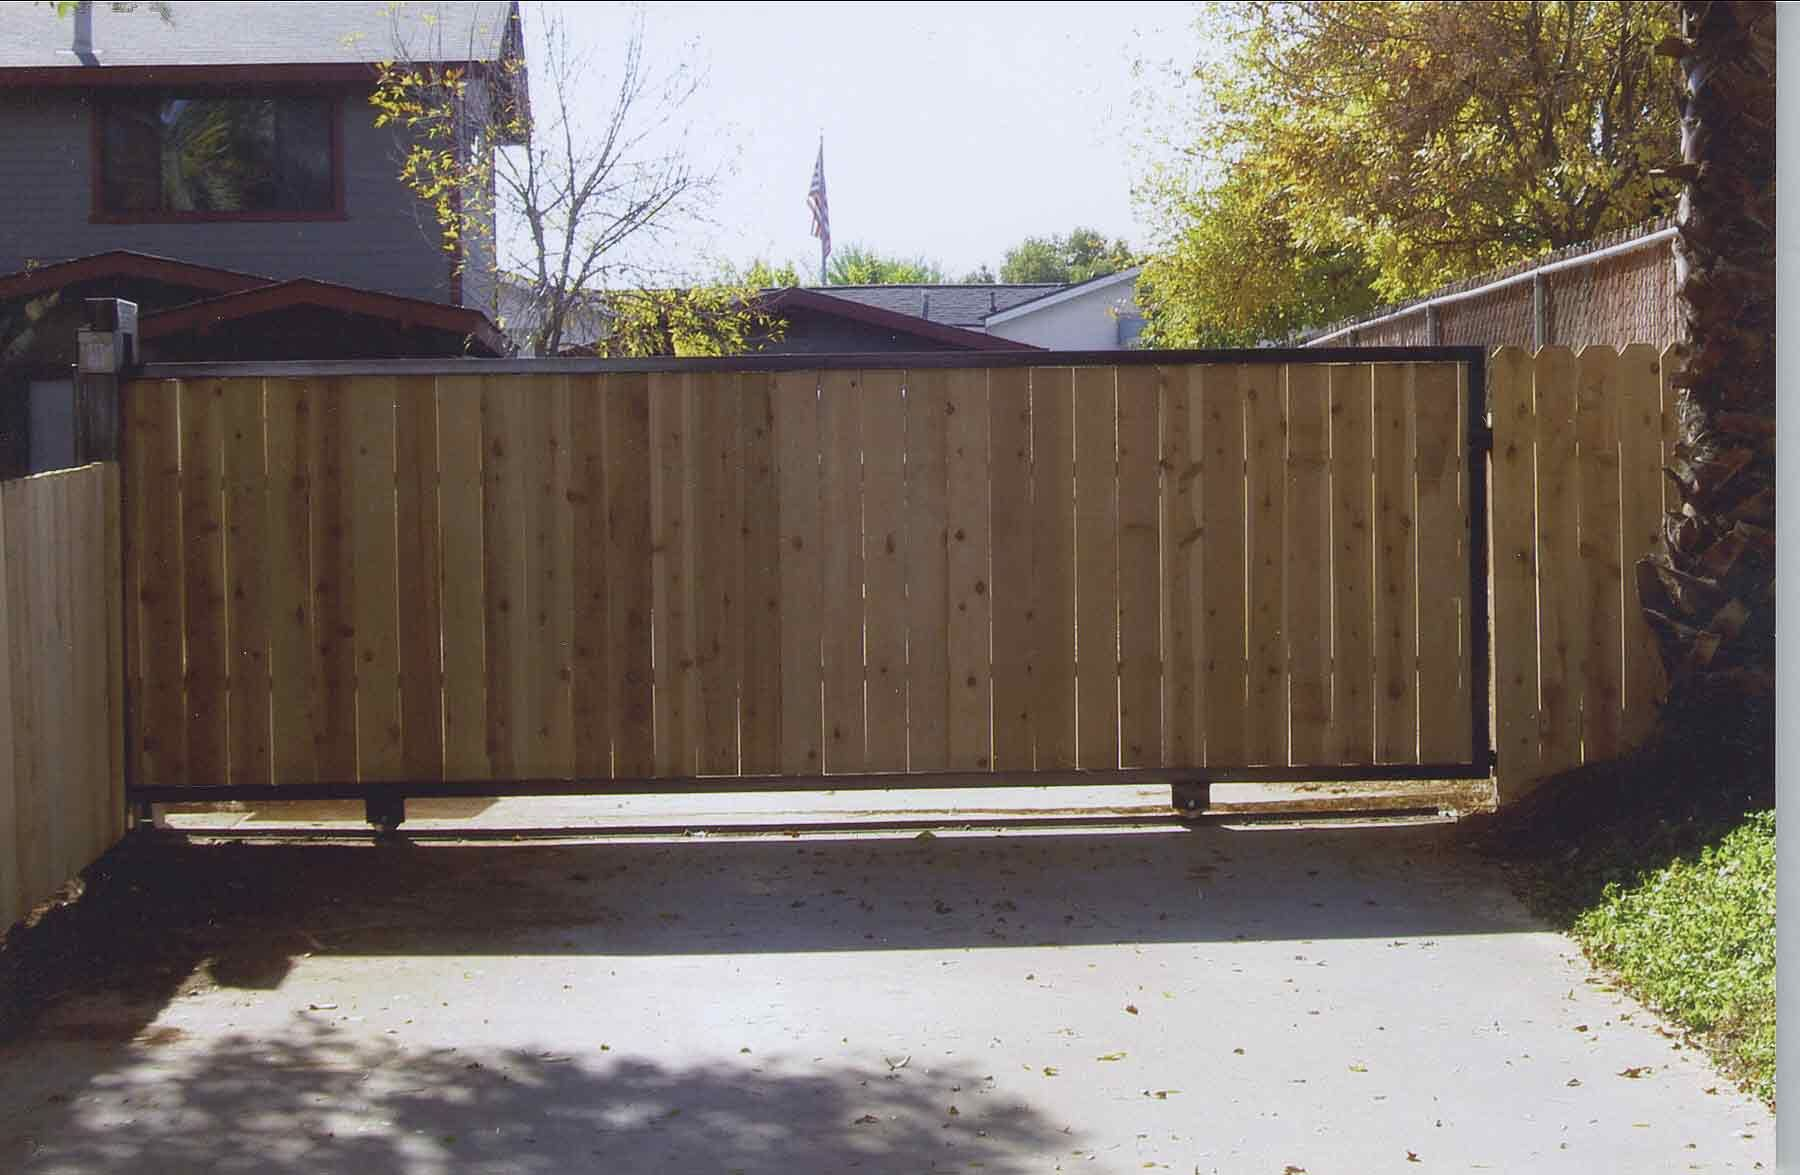 Inexpensive Wood Driveway Gates Miami For Wood Gate Wooden Gates Driveway Driveway Gate Wood Gates Driveway